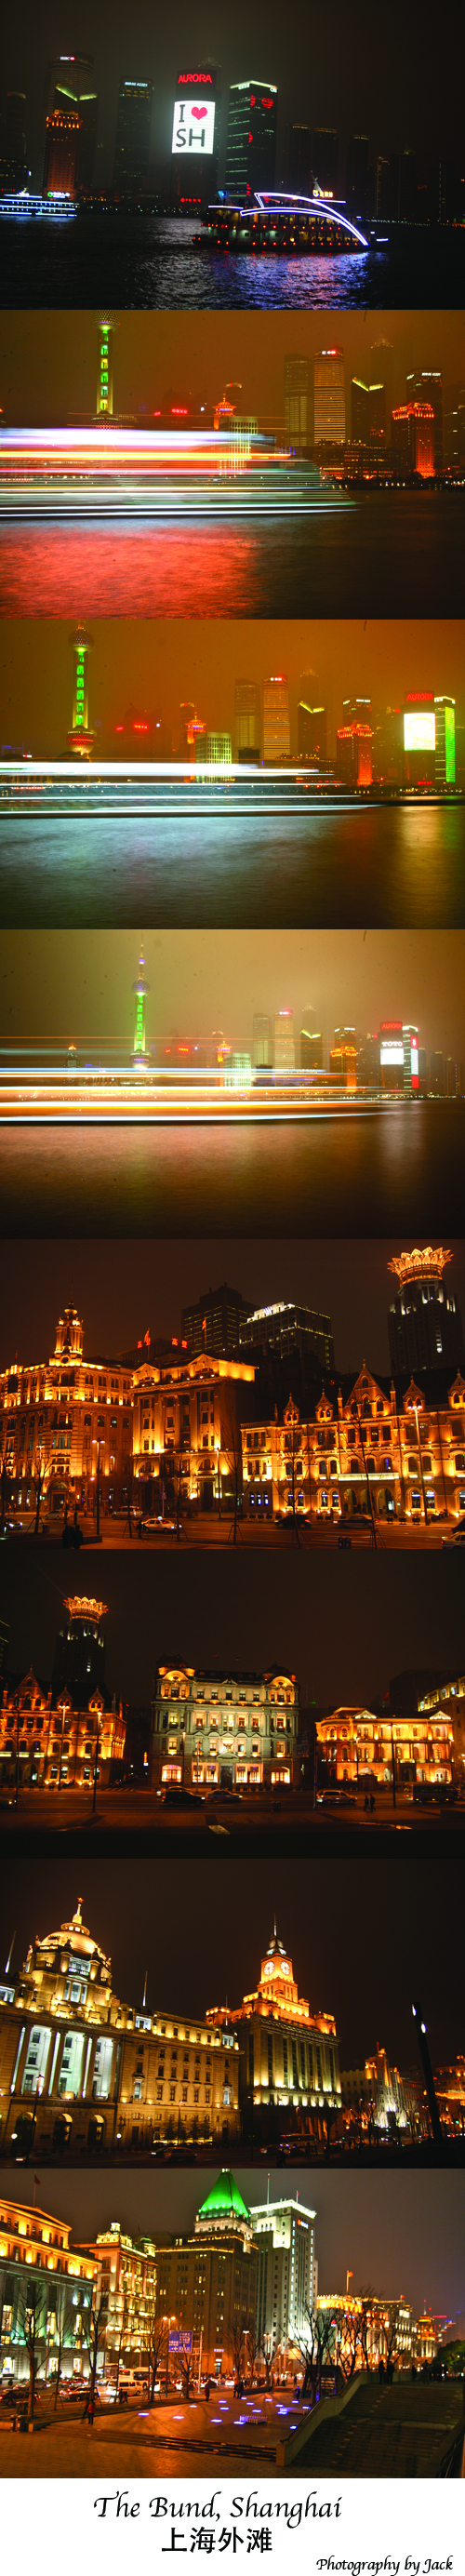 The Bund 上海外滩